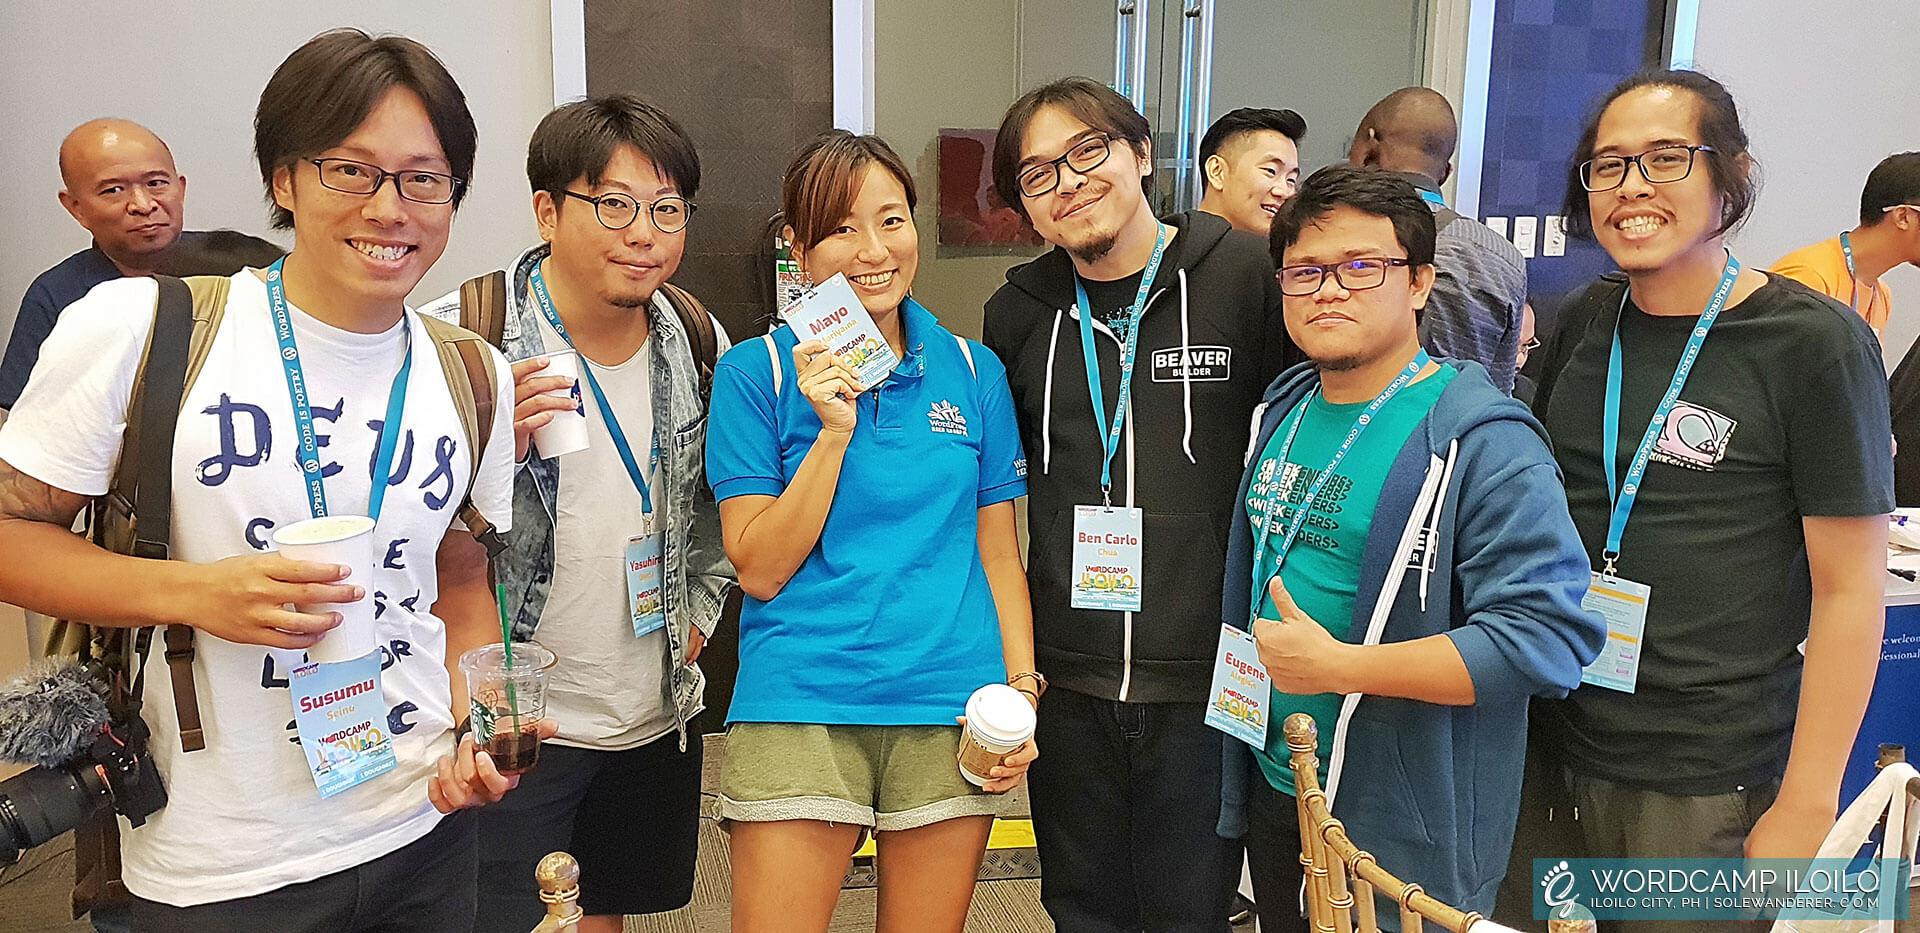 Meet New People WordCamp Iloilo 2018